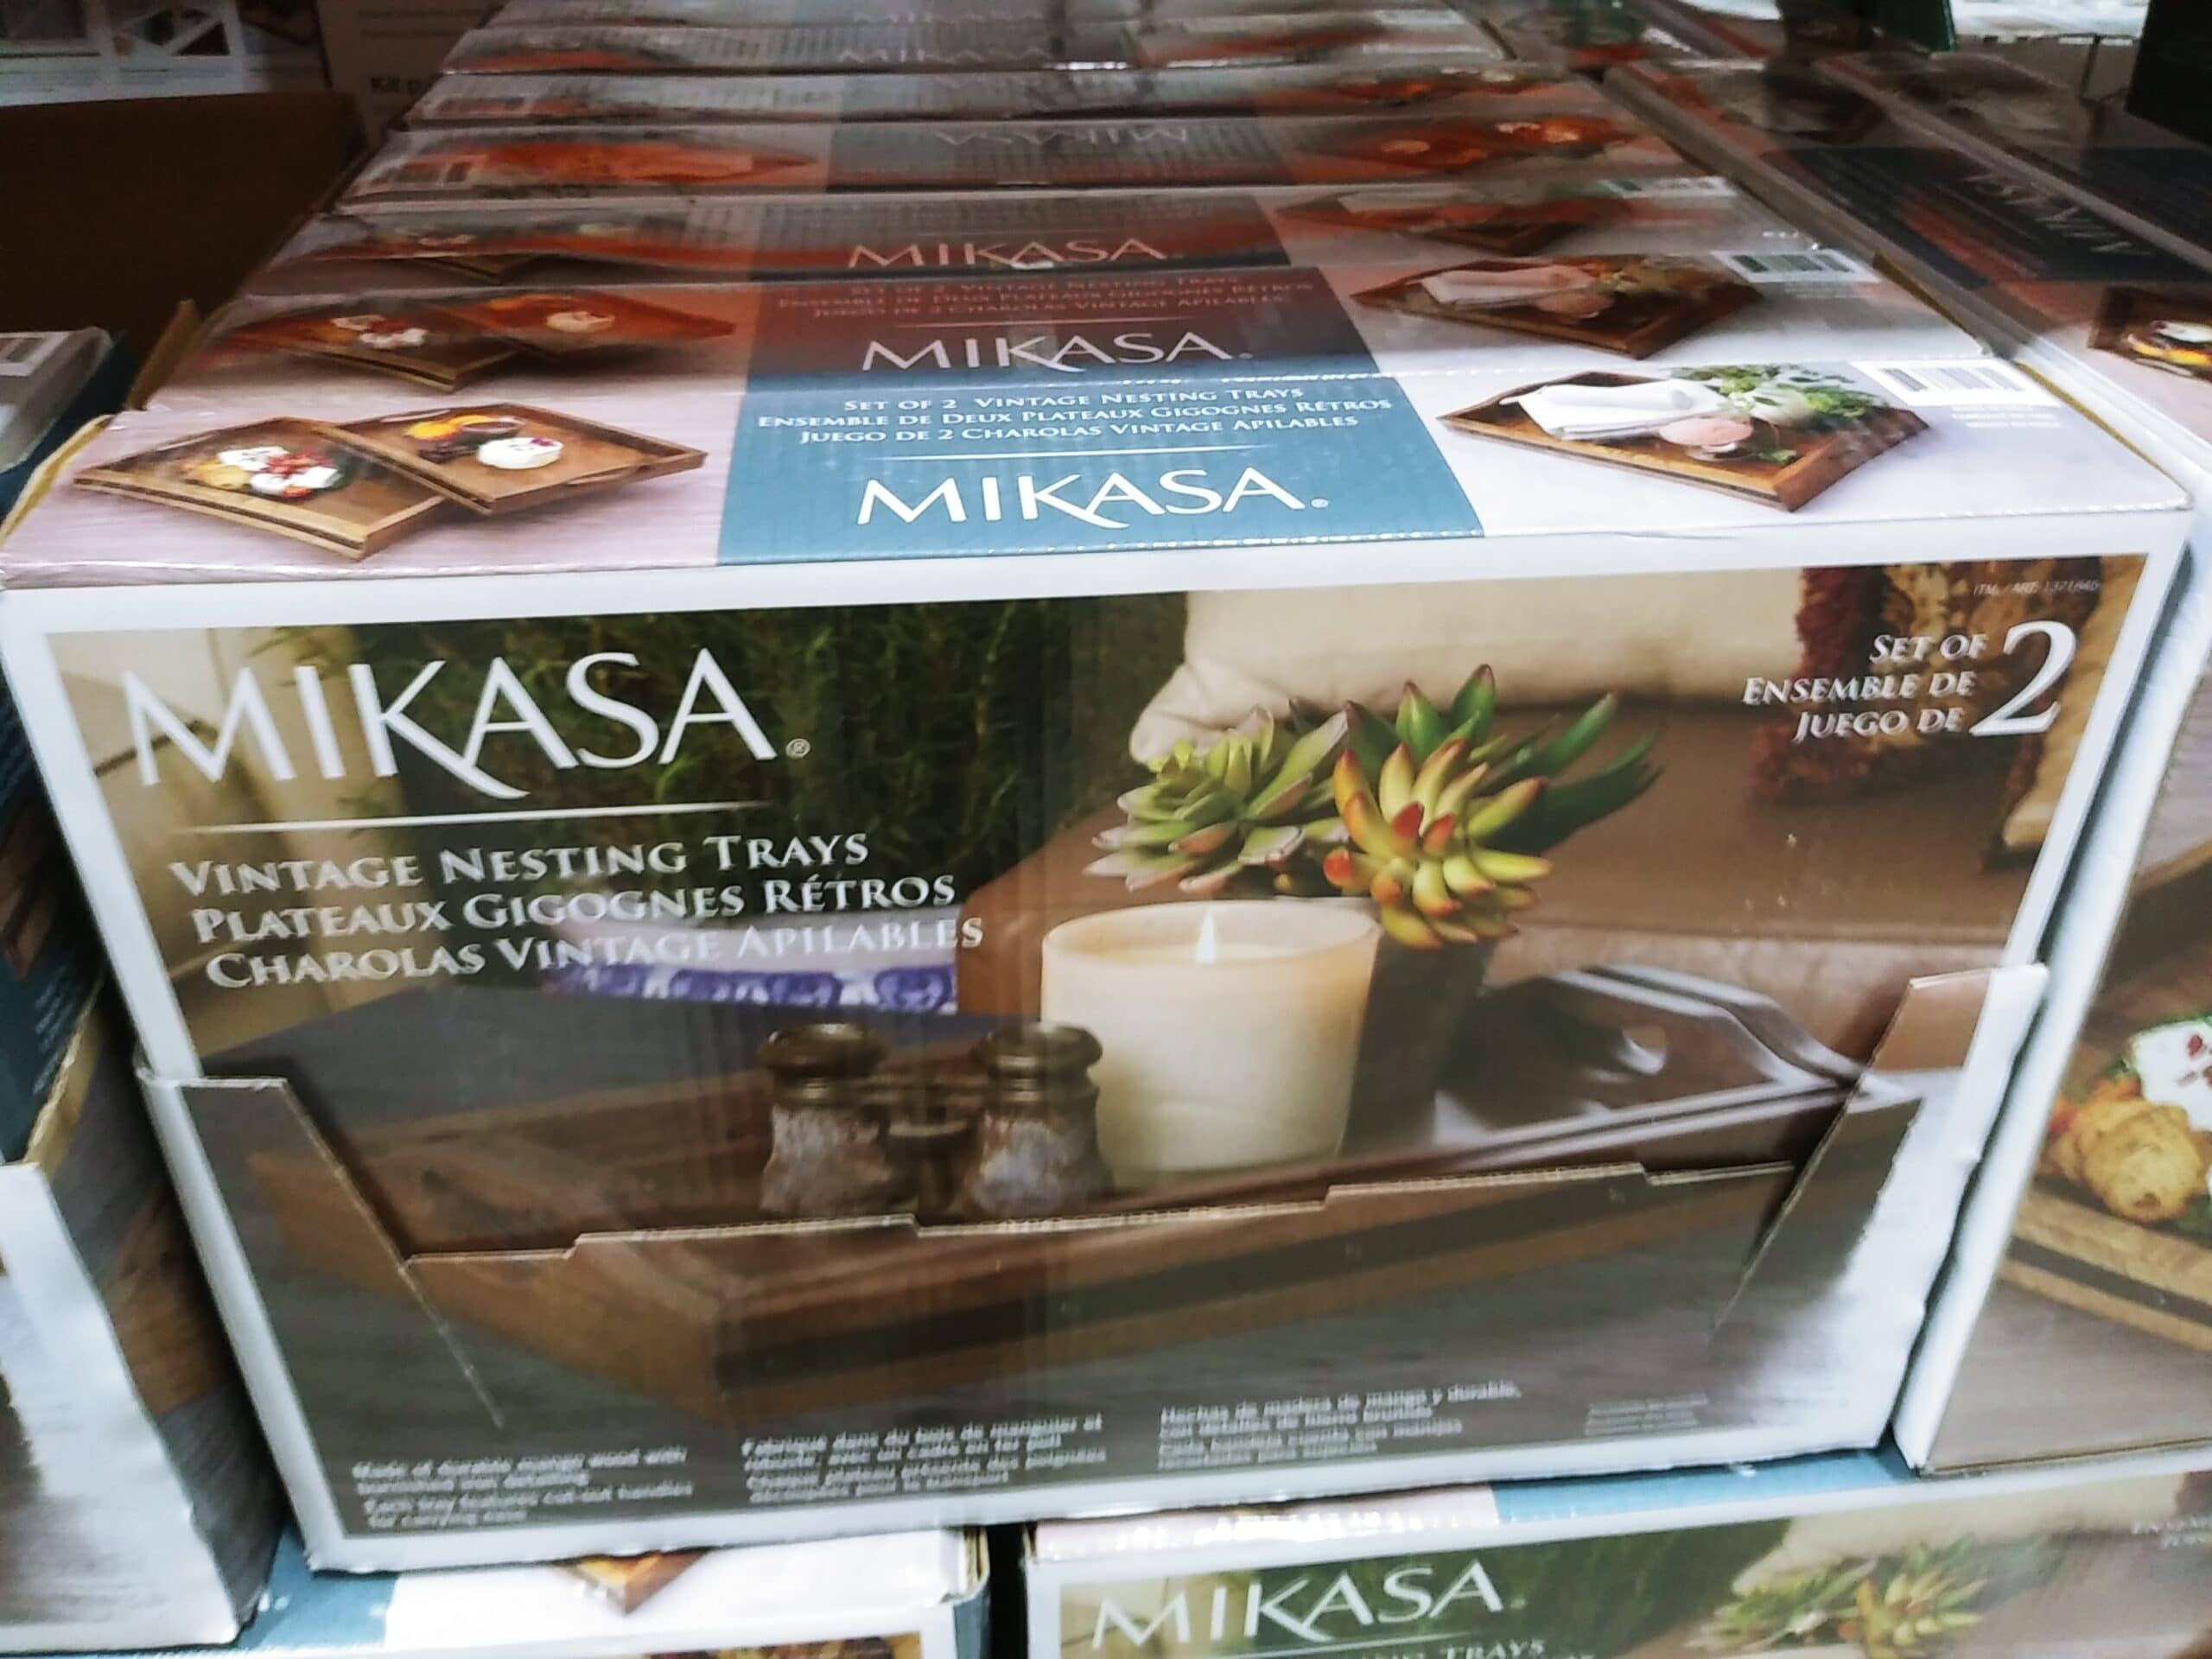 Mikasa Vintage Nesting Trays 2pk $22.97